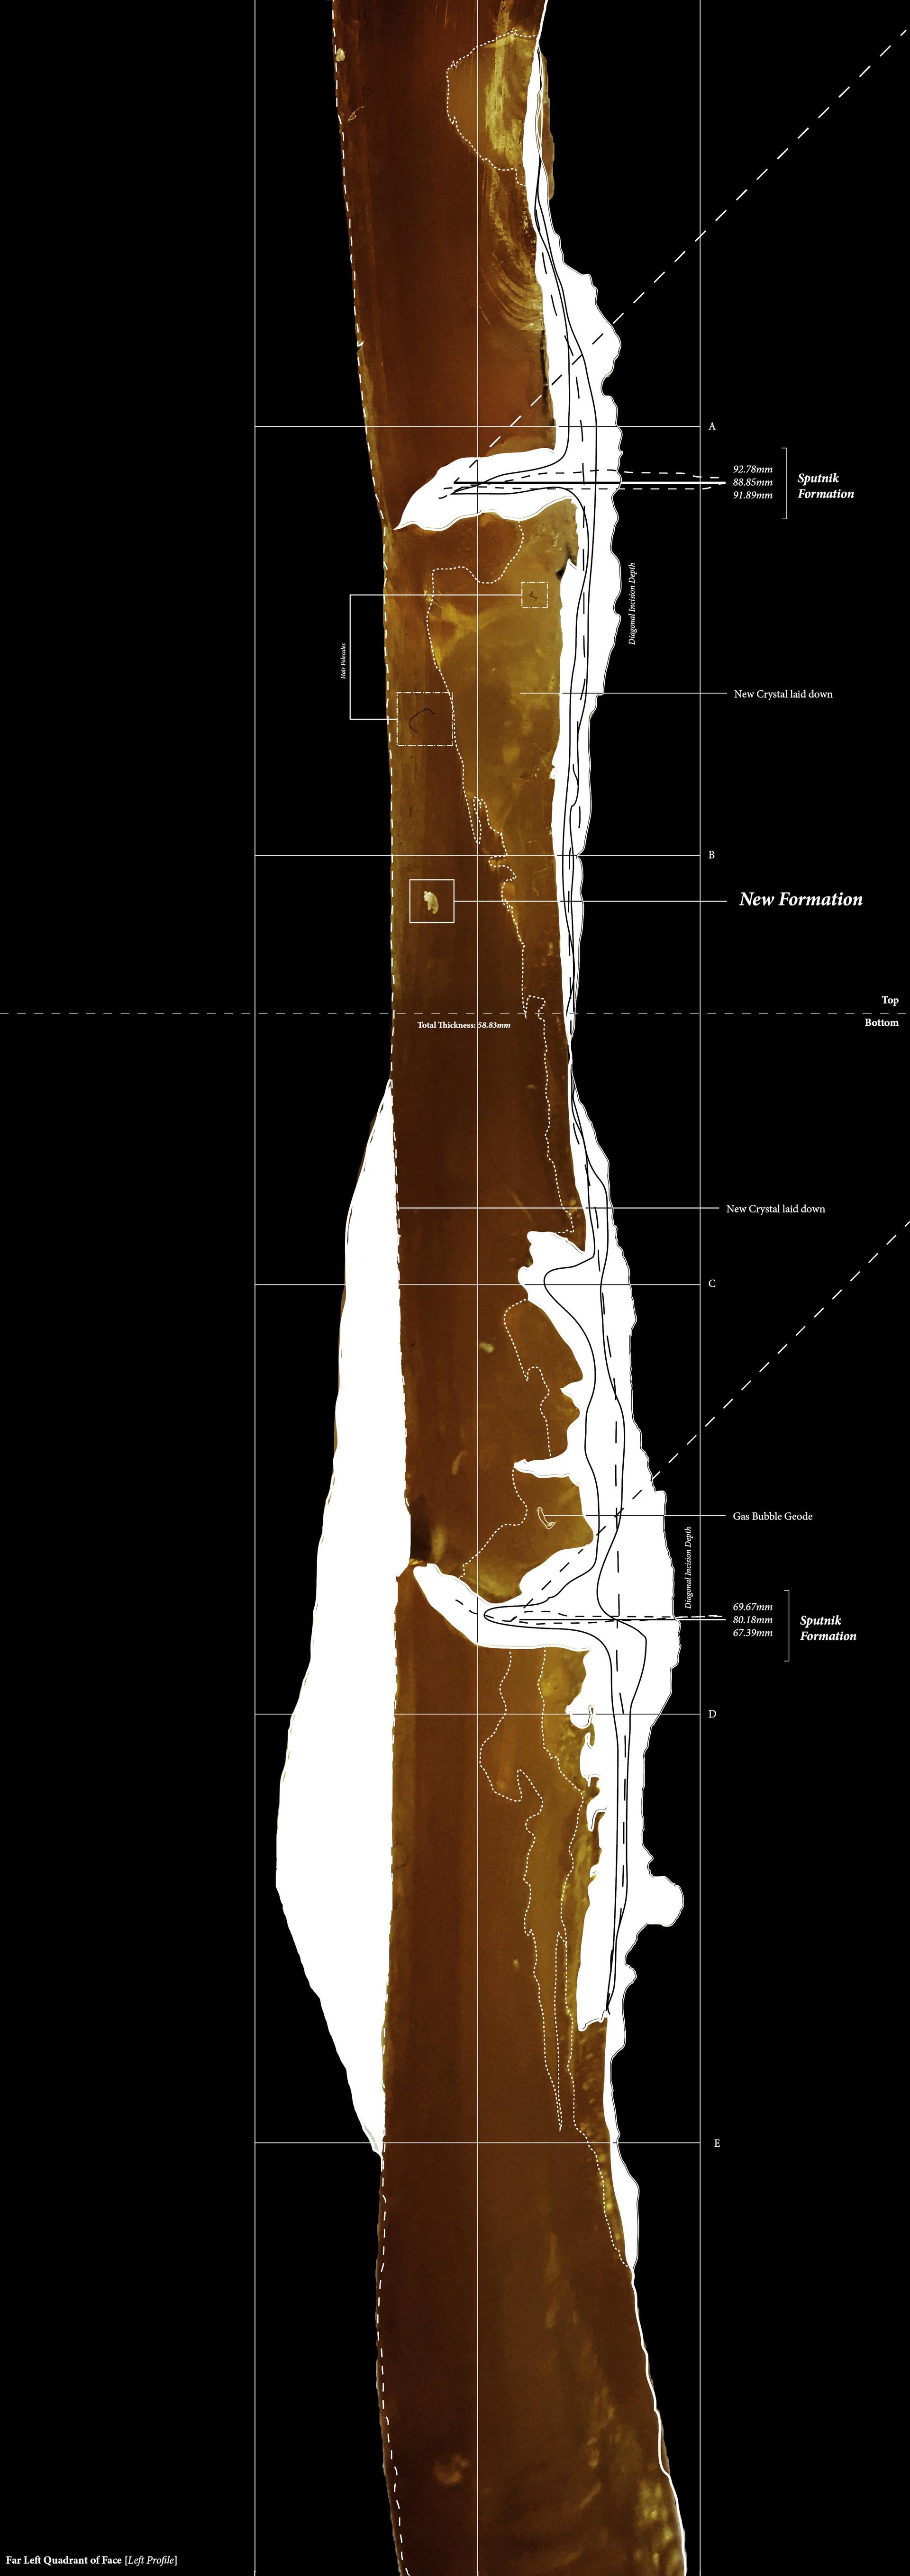 Nodule Formation, Skin of Dress: Tuareg. Murray, T. Unit 12. 2019